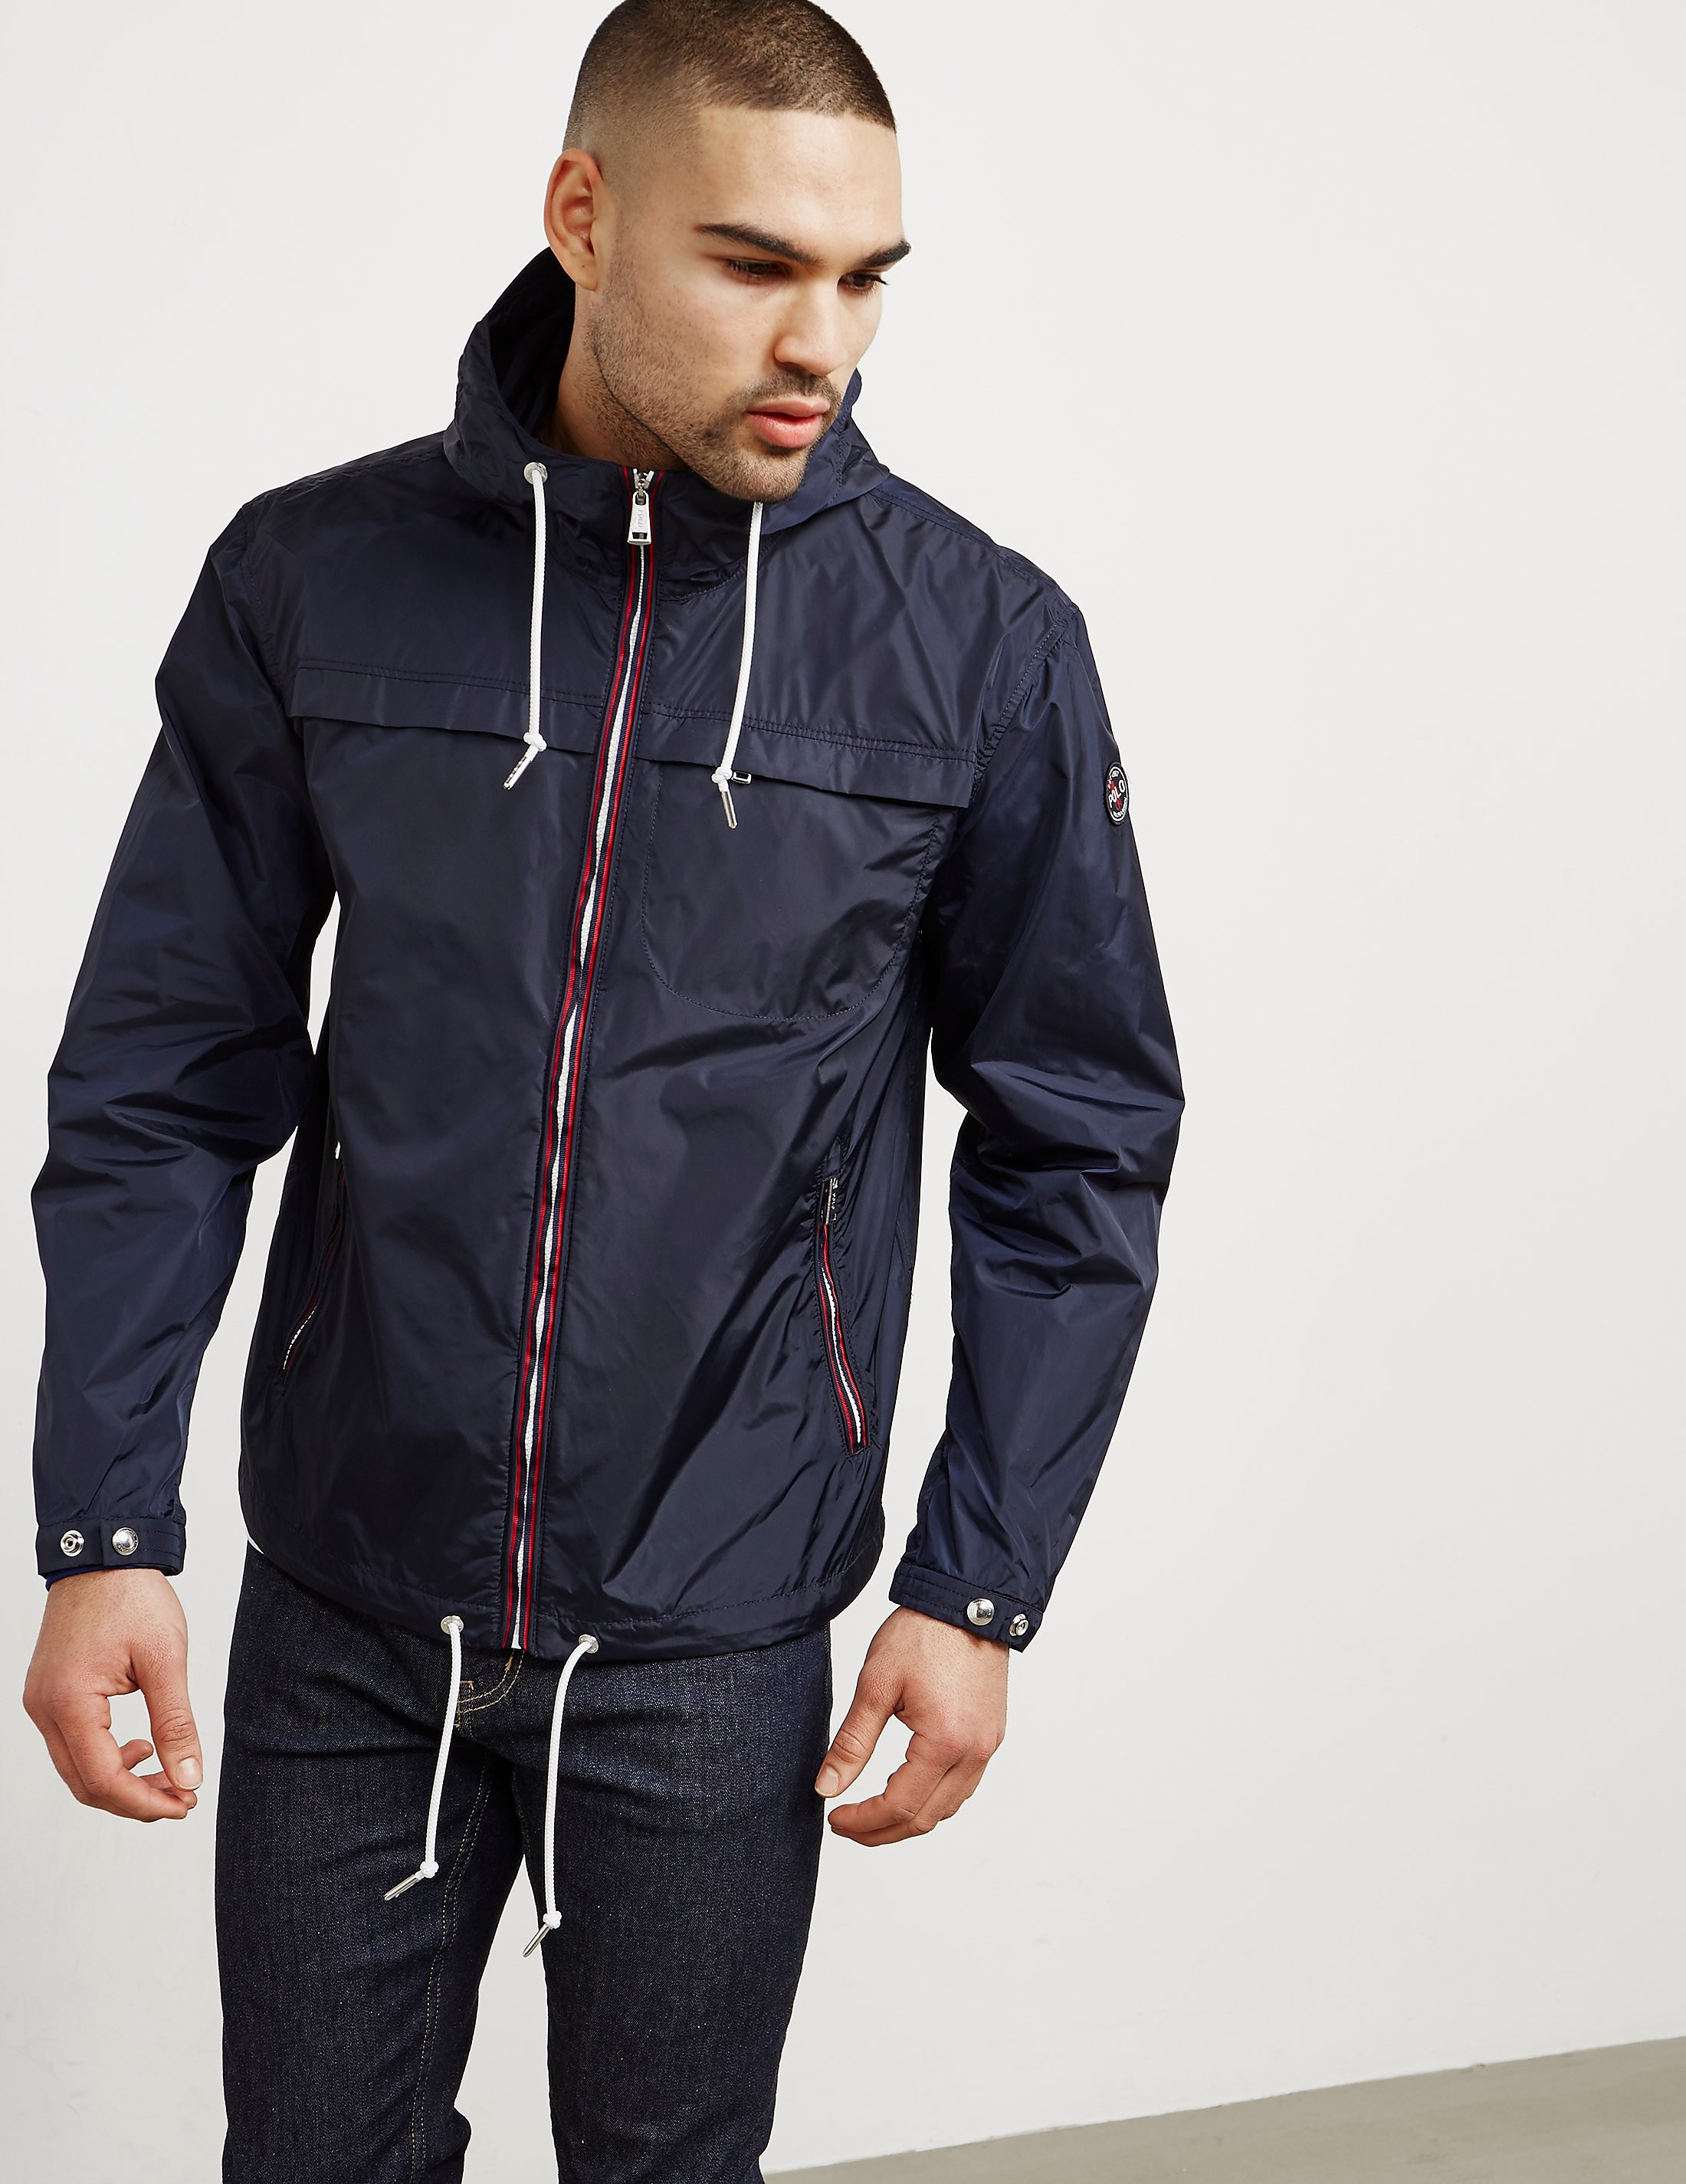 Polo Ralph Lauren Benton Light Jacket